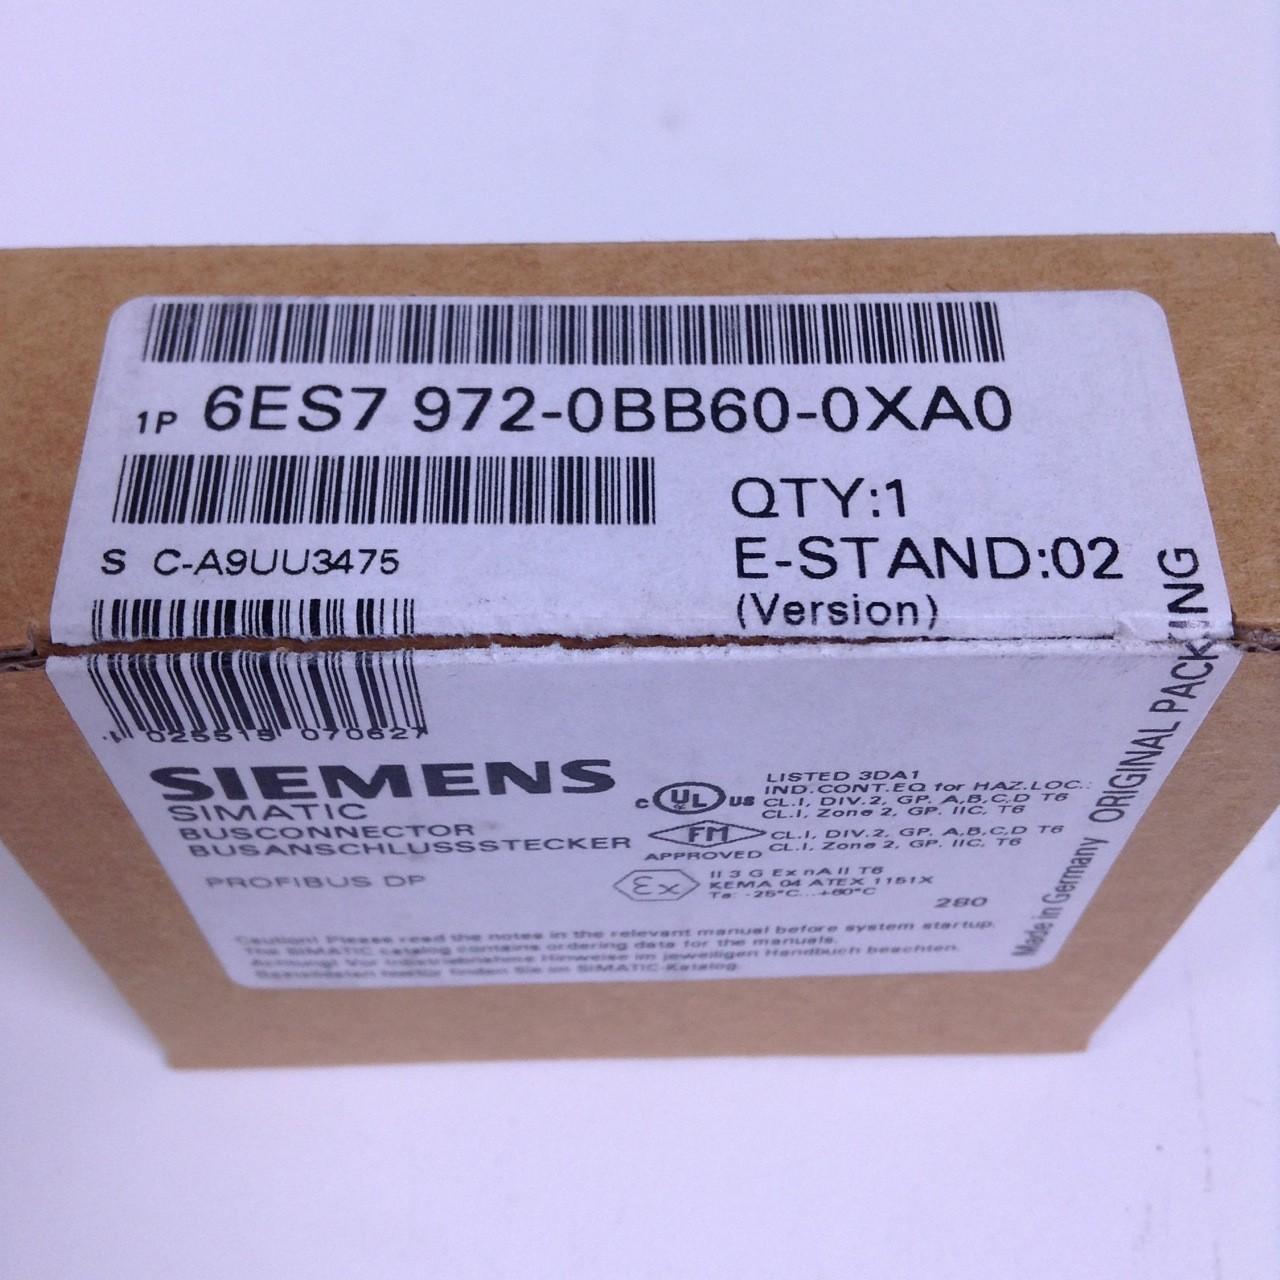 Siemens 6ES7 972-0BB60-0XA0 6ES7972-0BB60-0XA0 E-Stand used 02 Busconnector